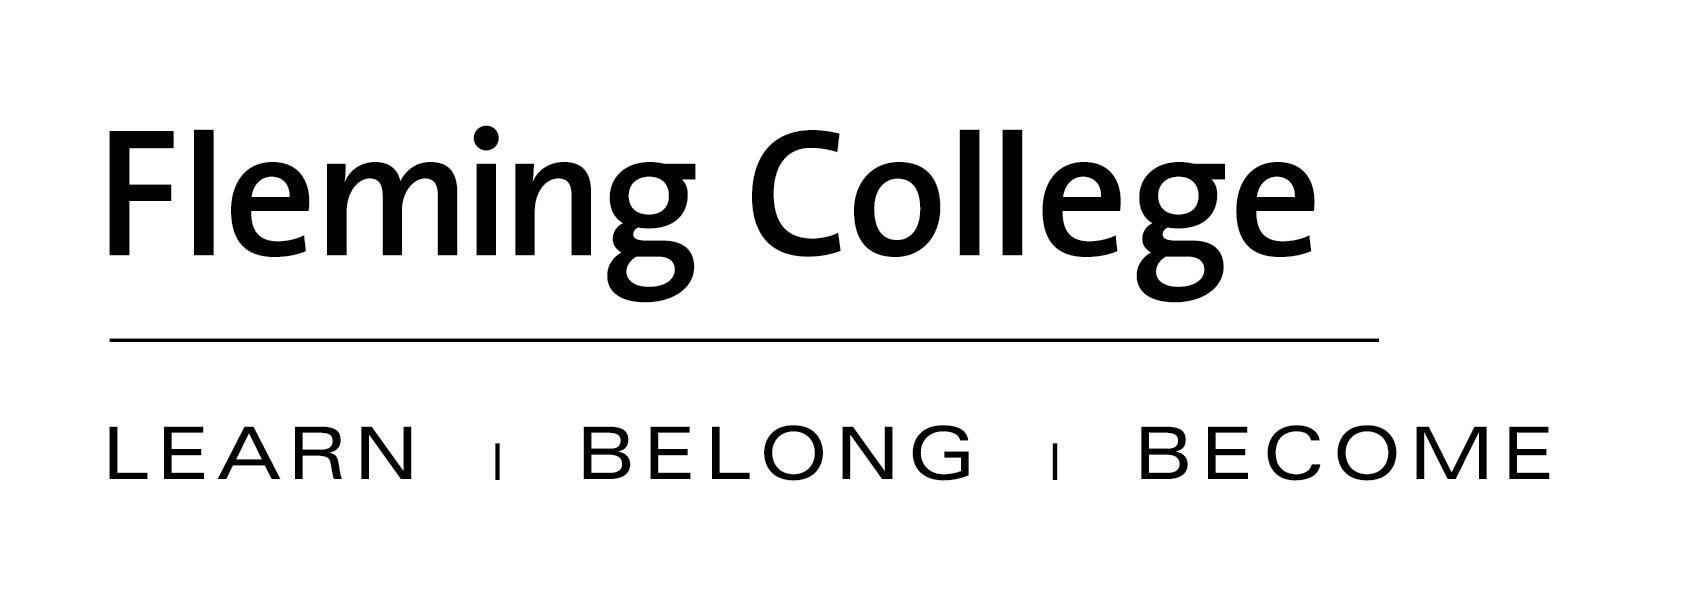 CA-TR-Fleming College.jpg